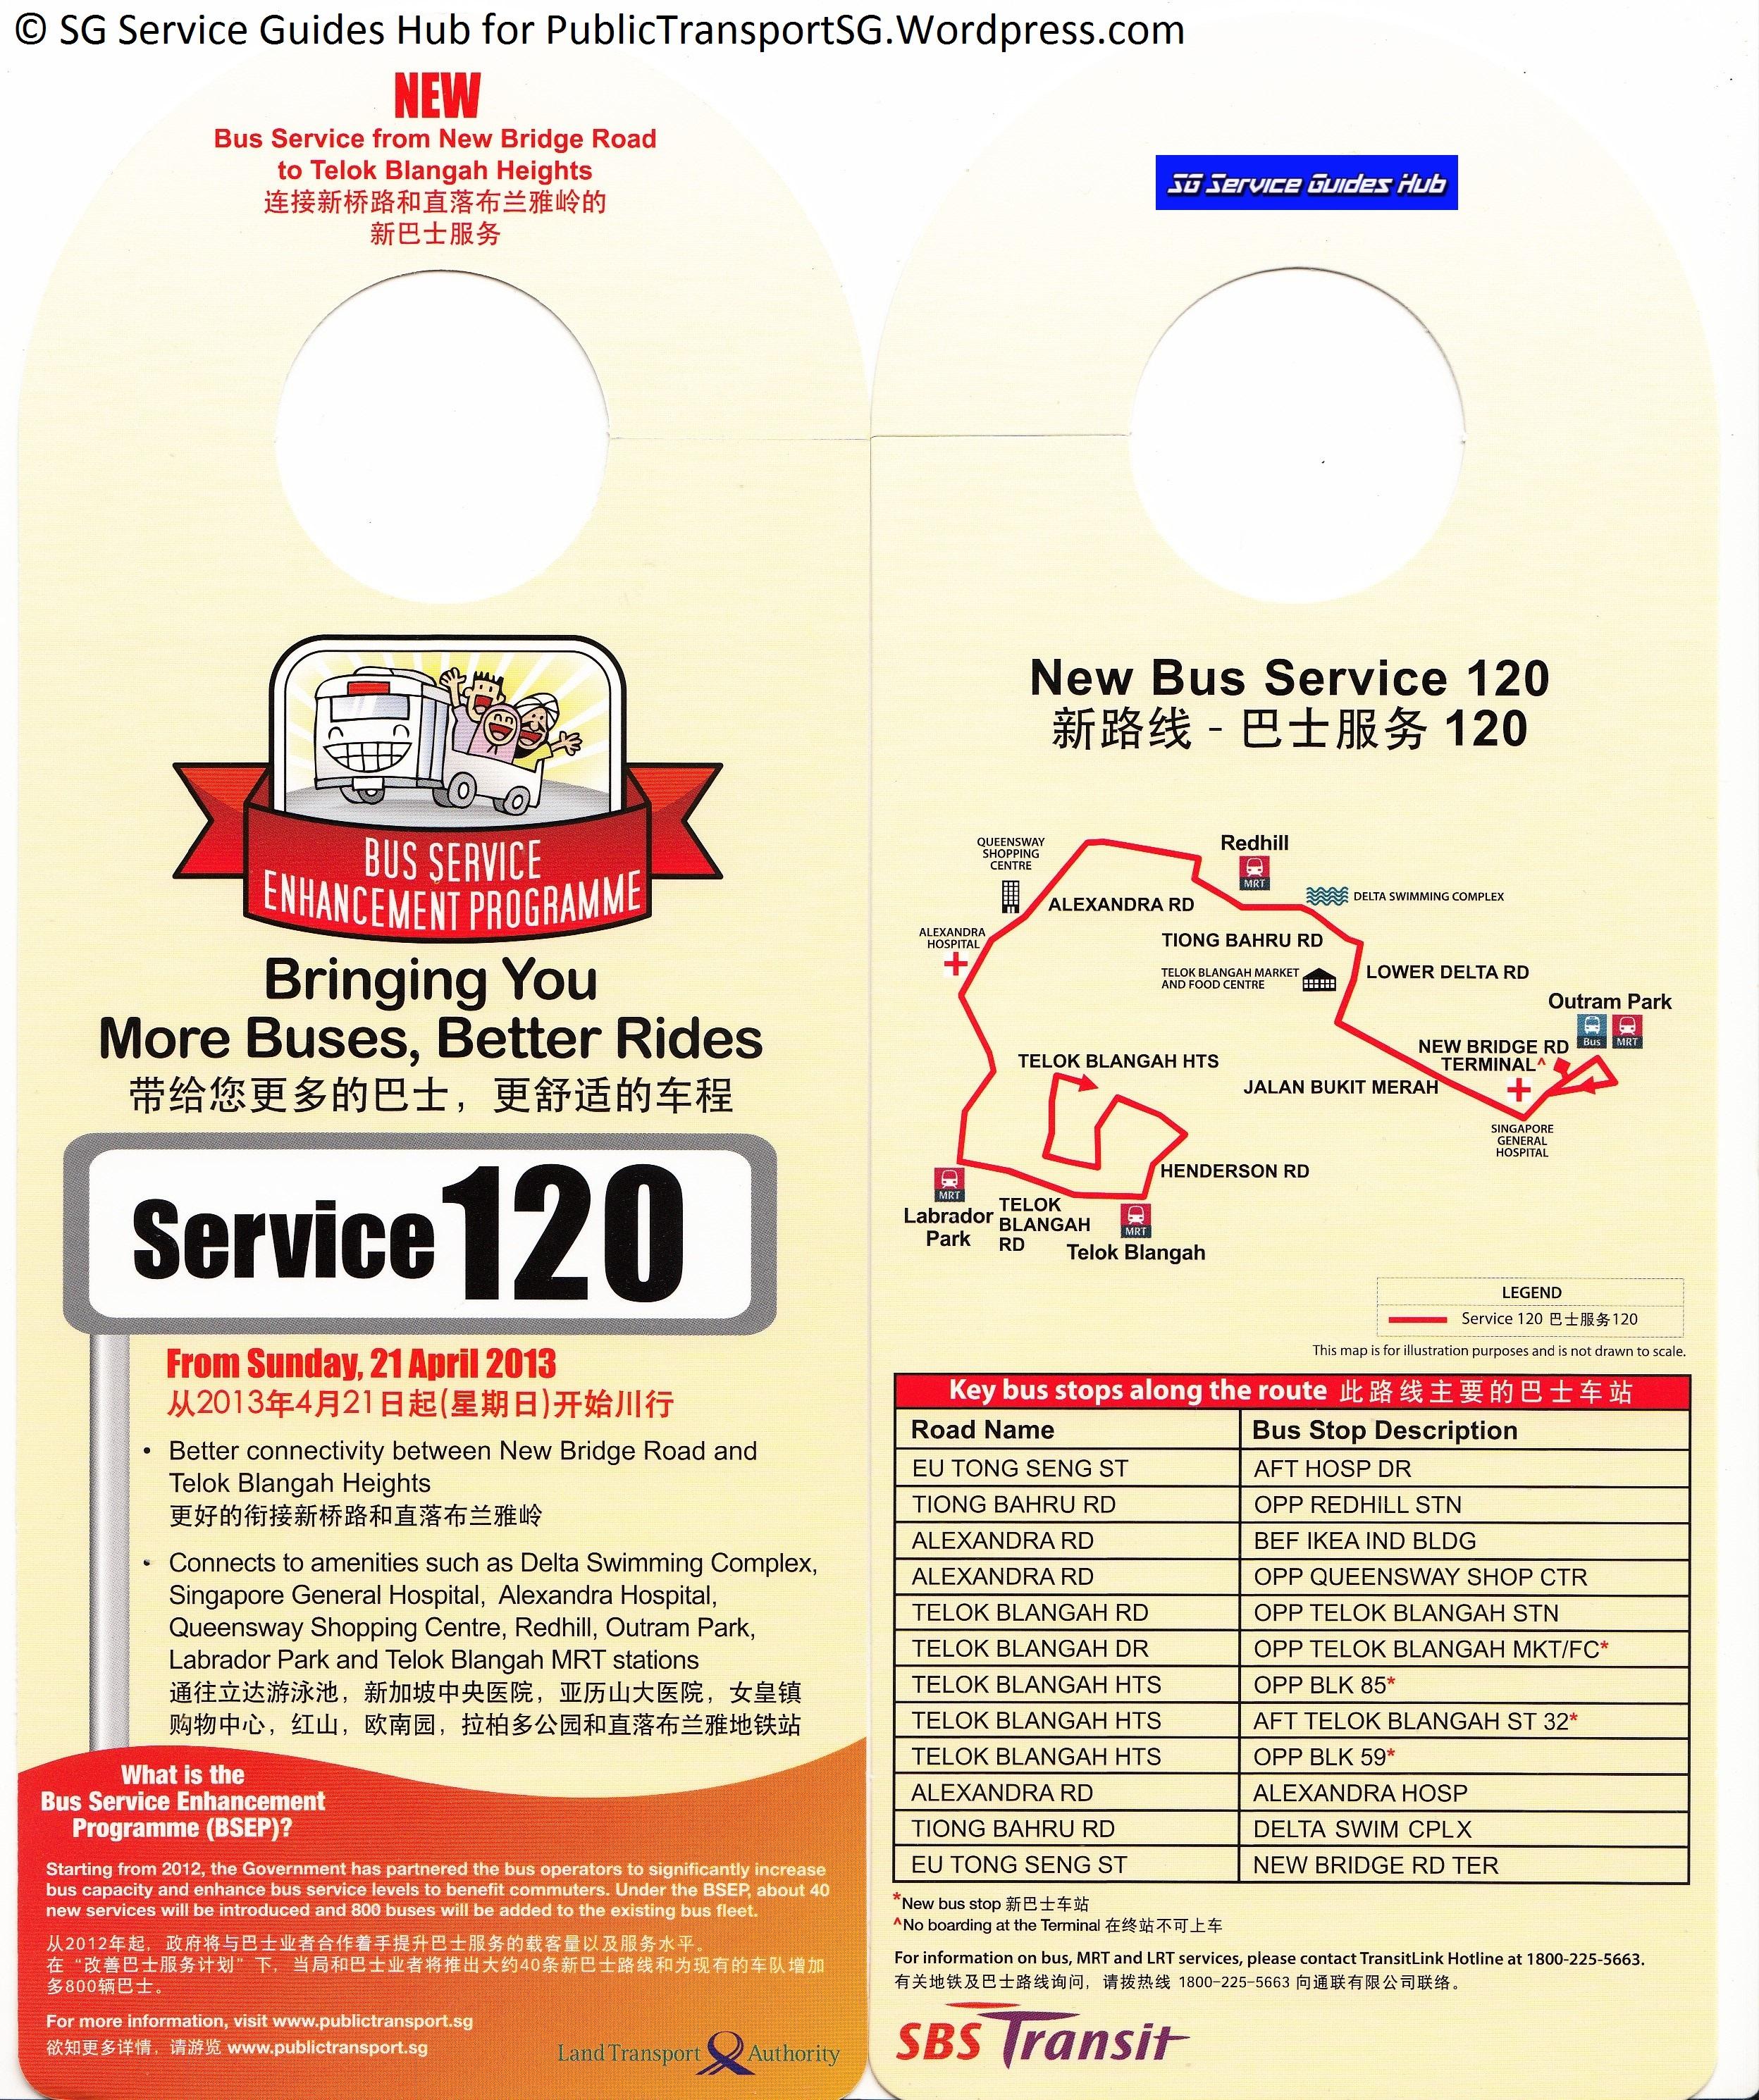 BSEP Promotional Hanger for Service 120